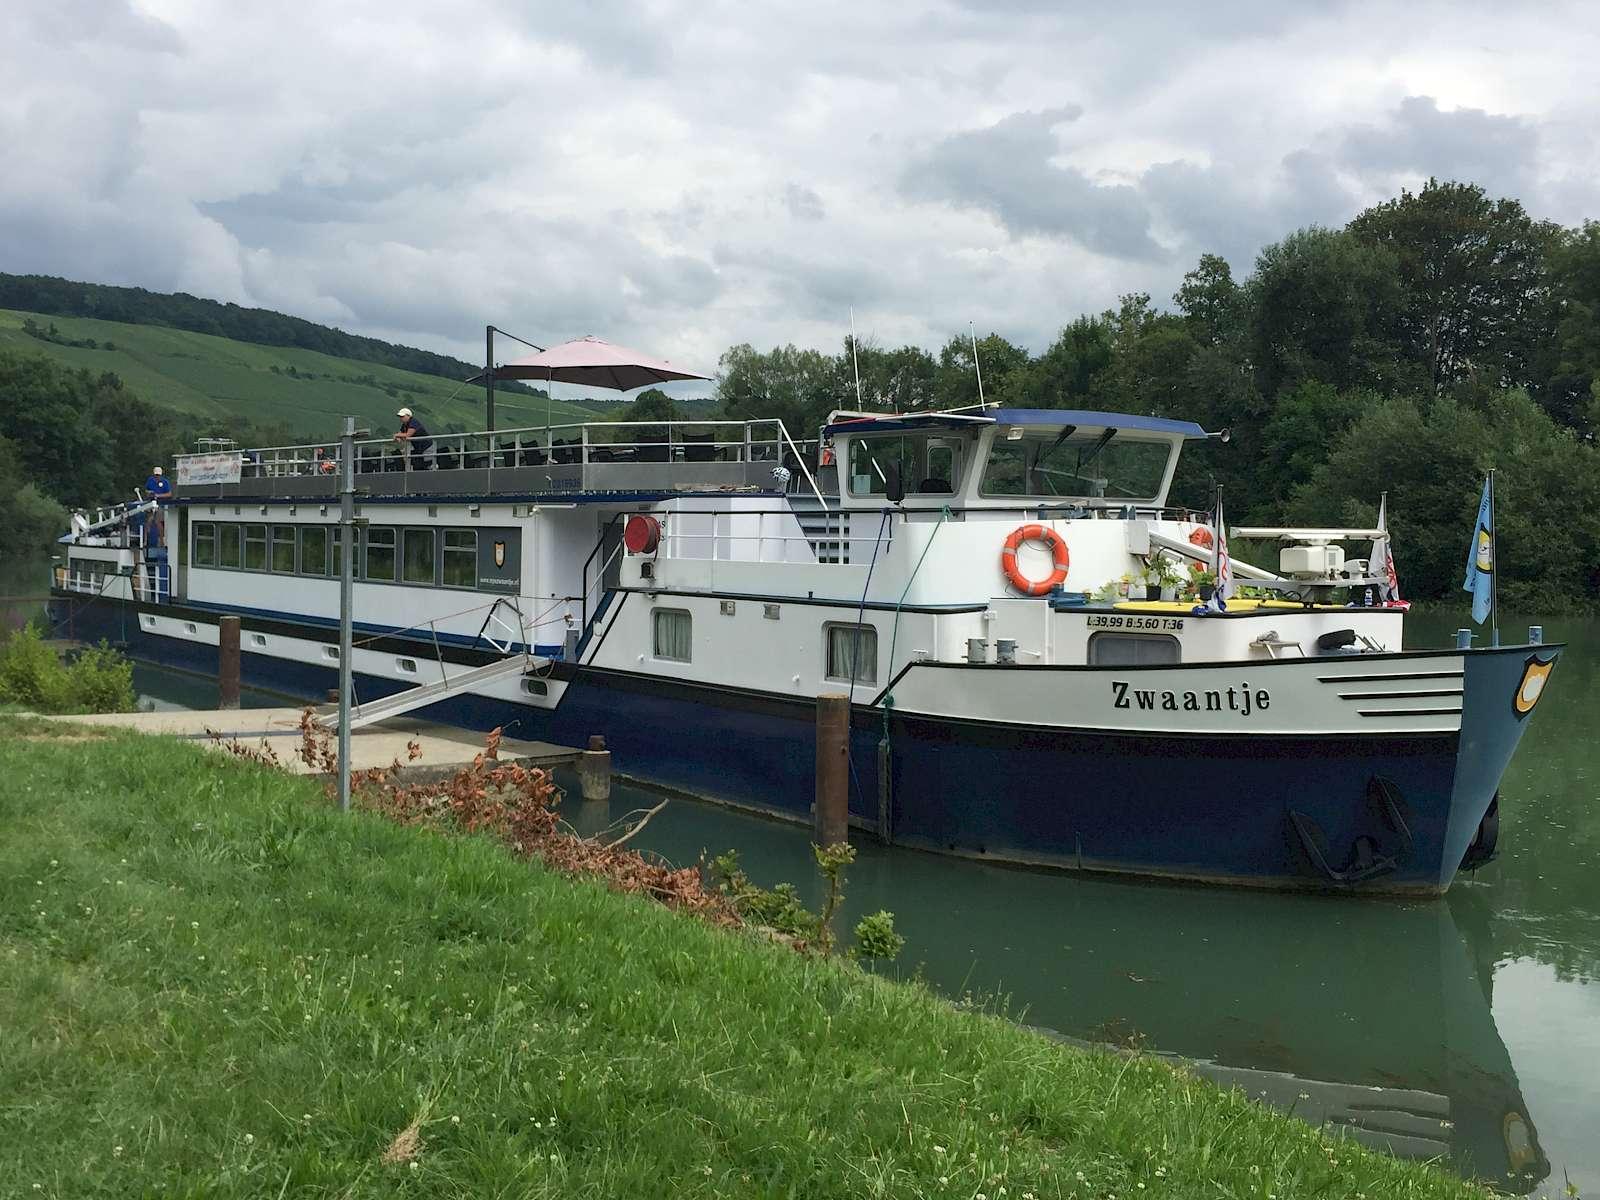 Zwaantje Barge